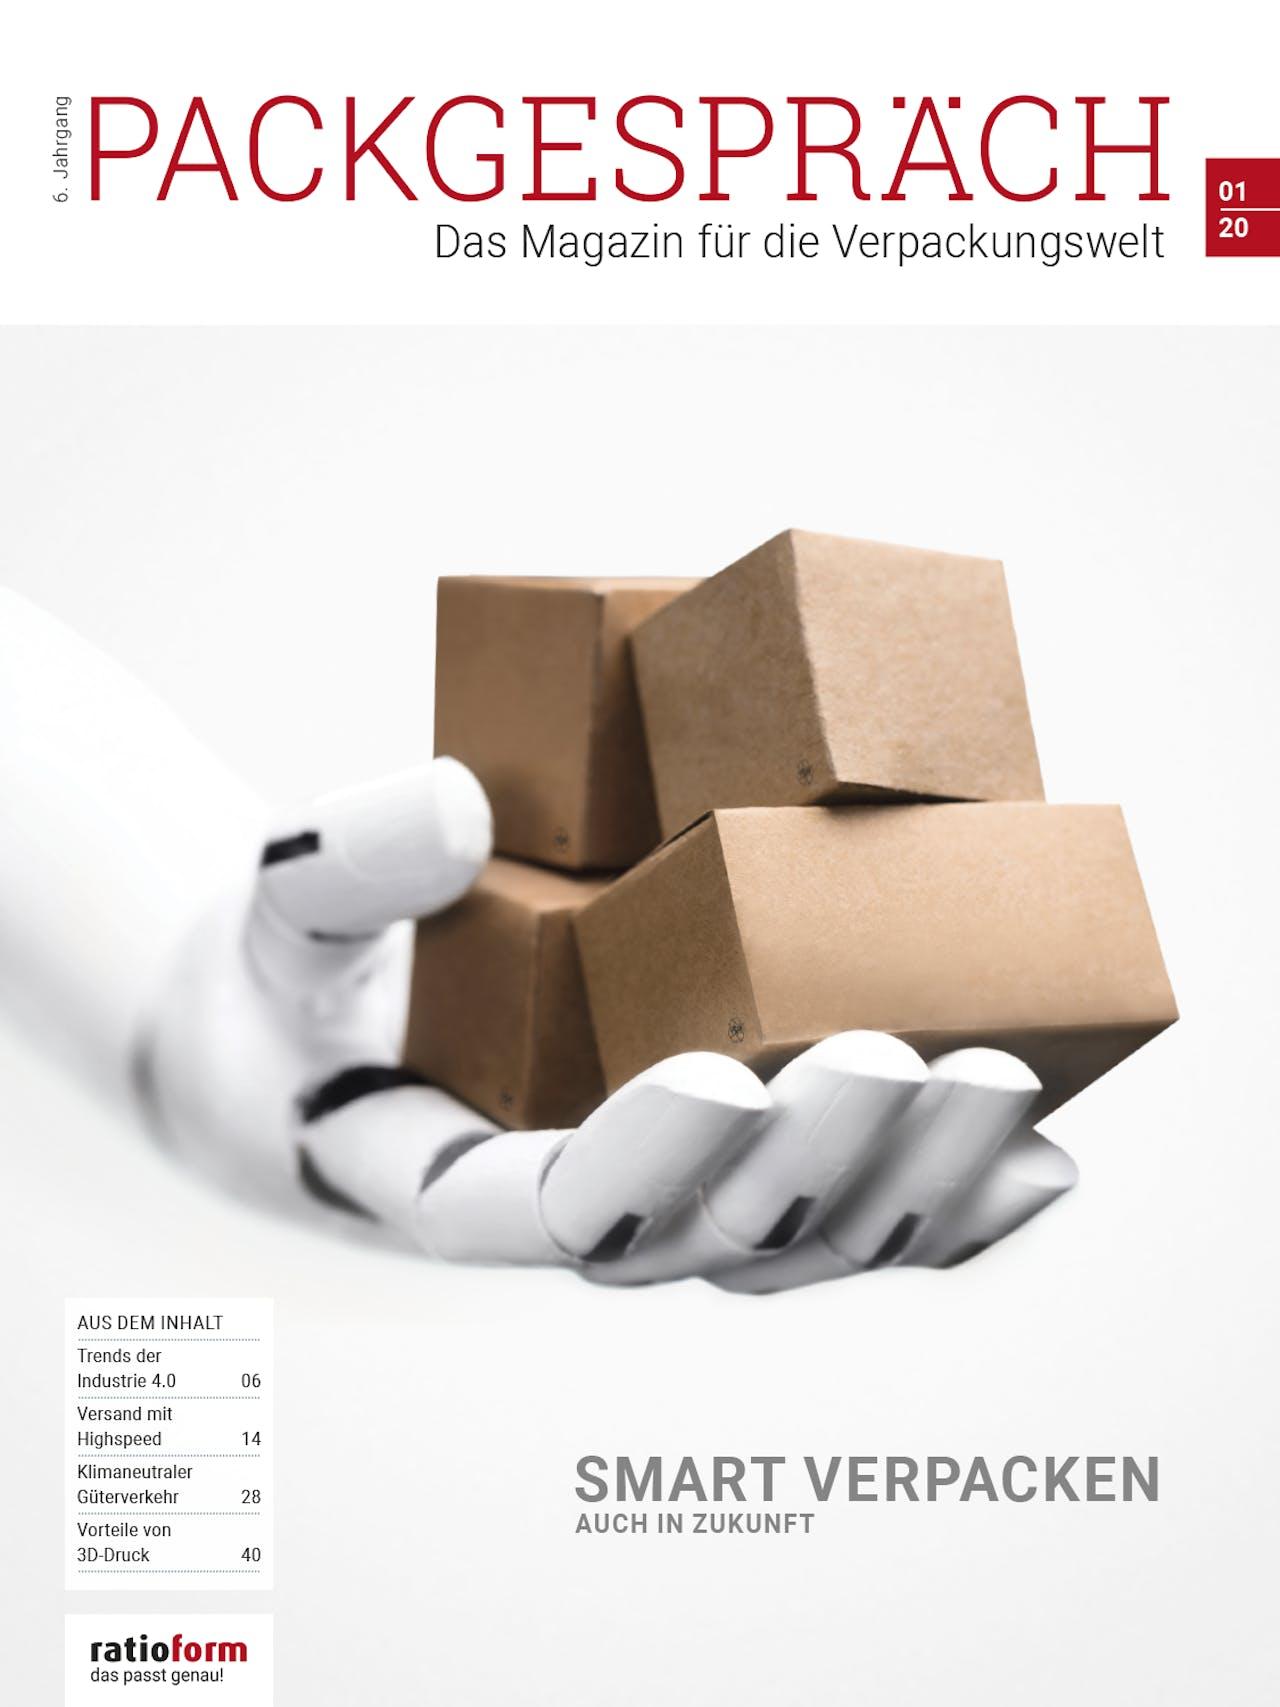 Packgespräch, Magazin Verpackungswelt 01 20